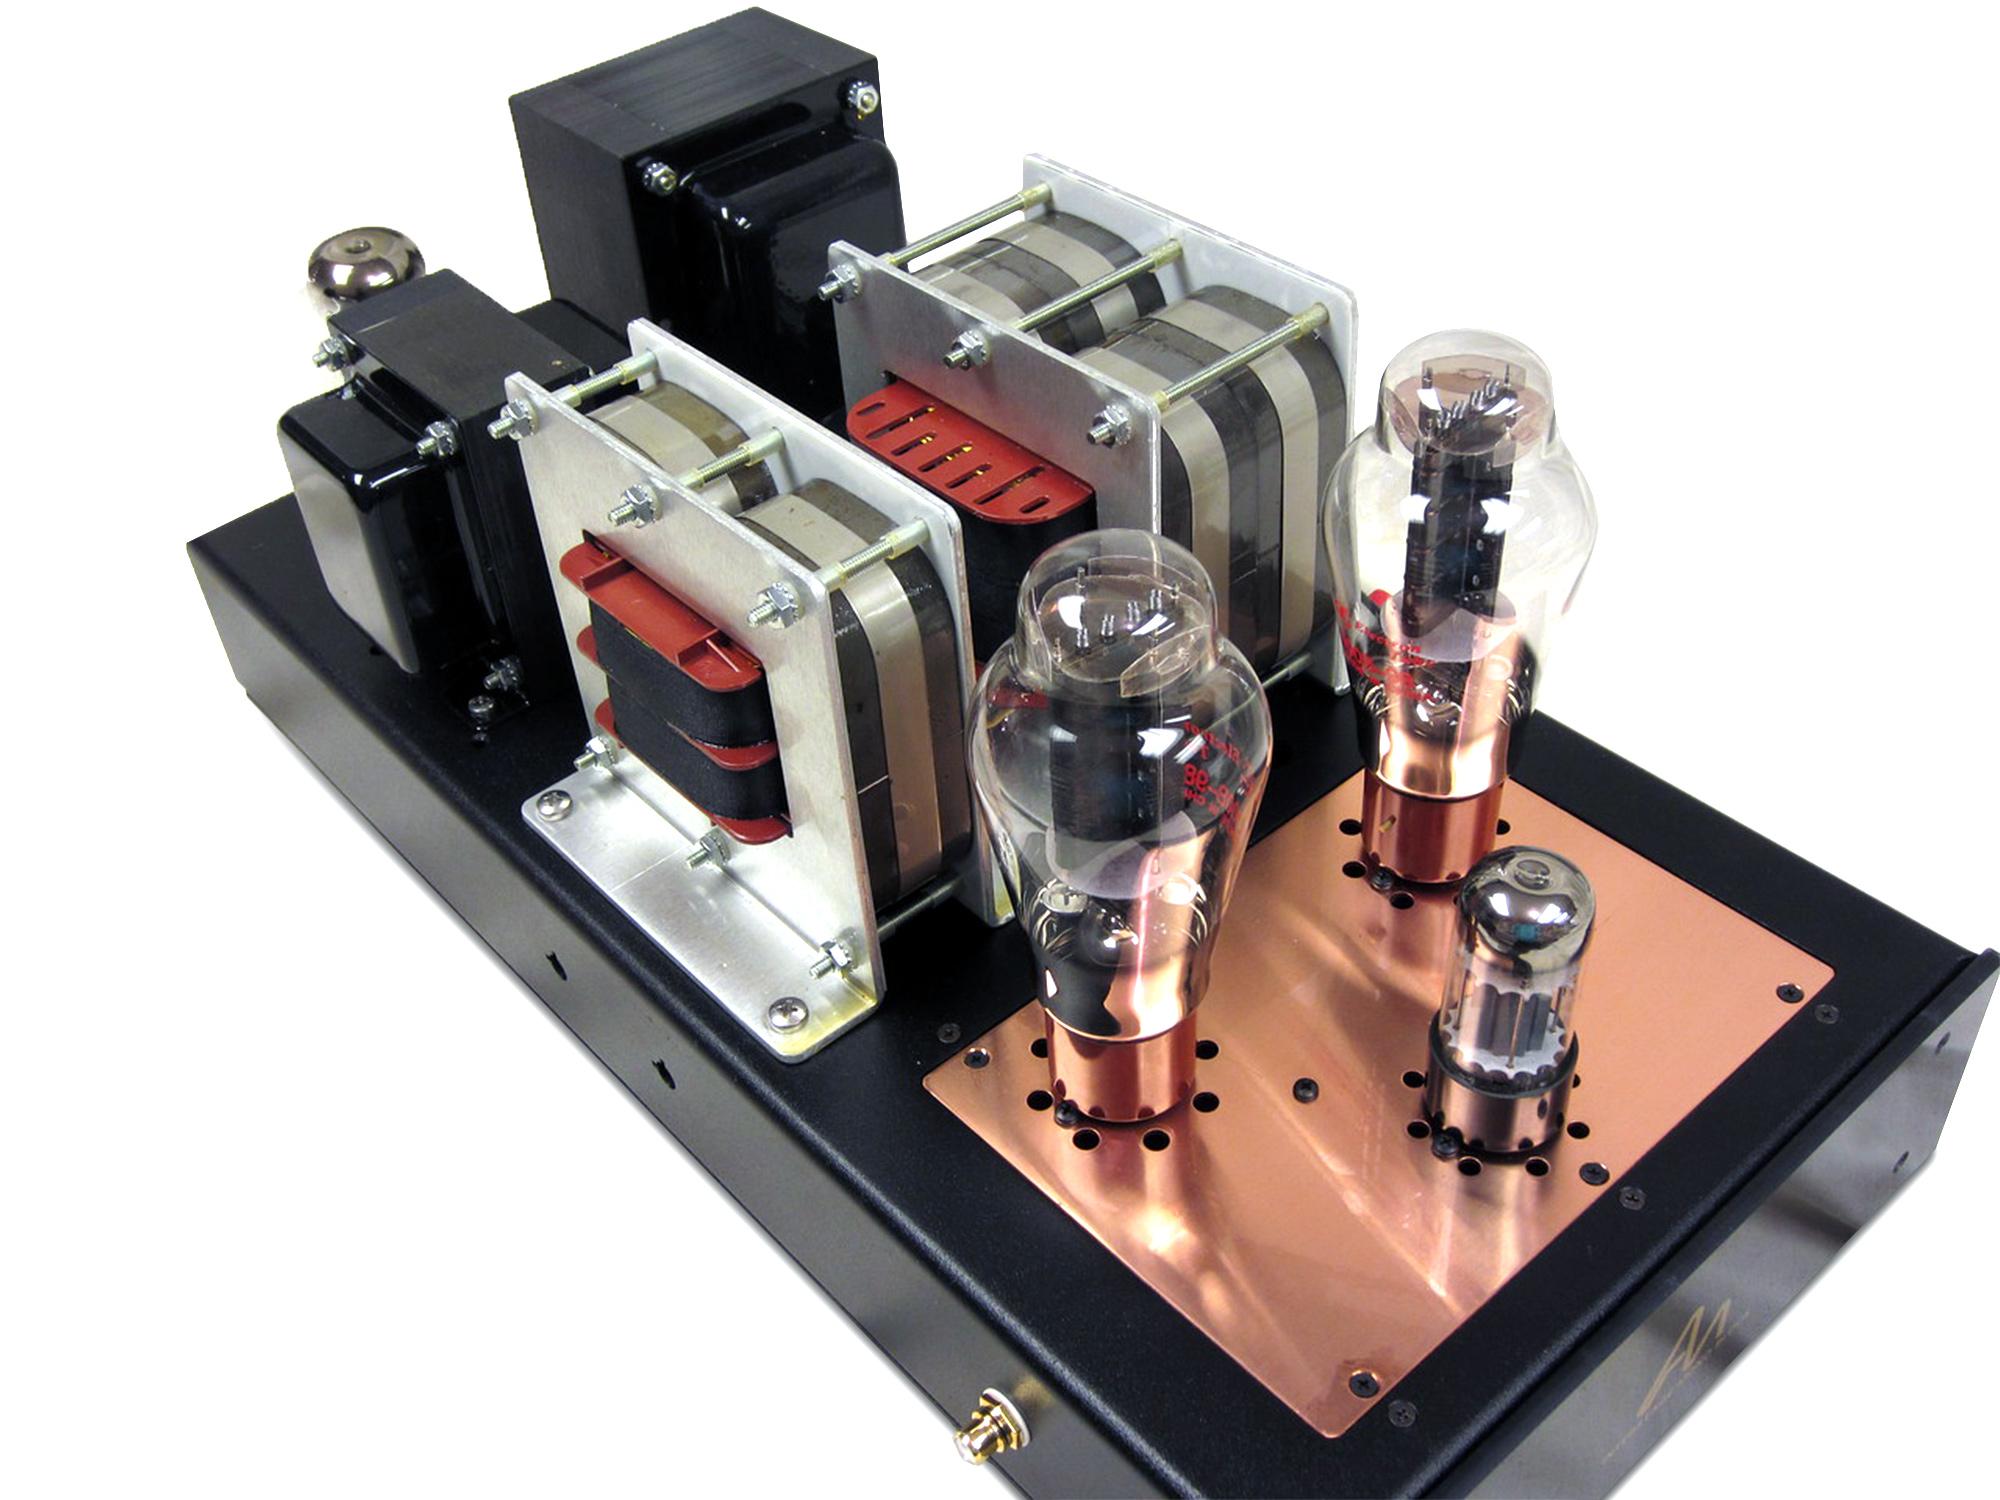 ANK Audio Kits 300B Interstage monoblock power amplifier